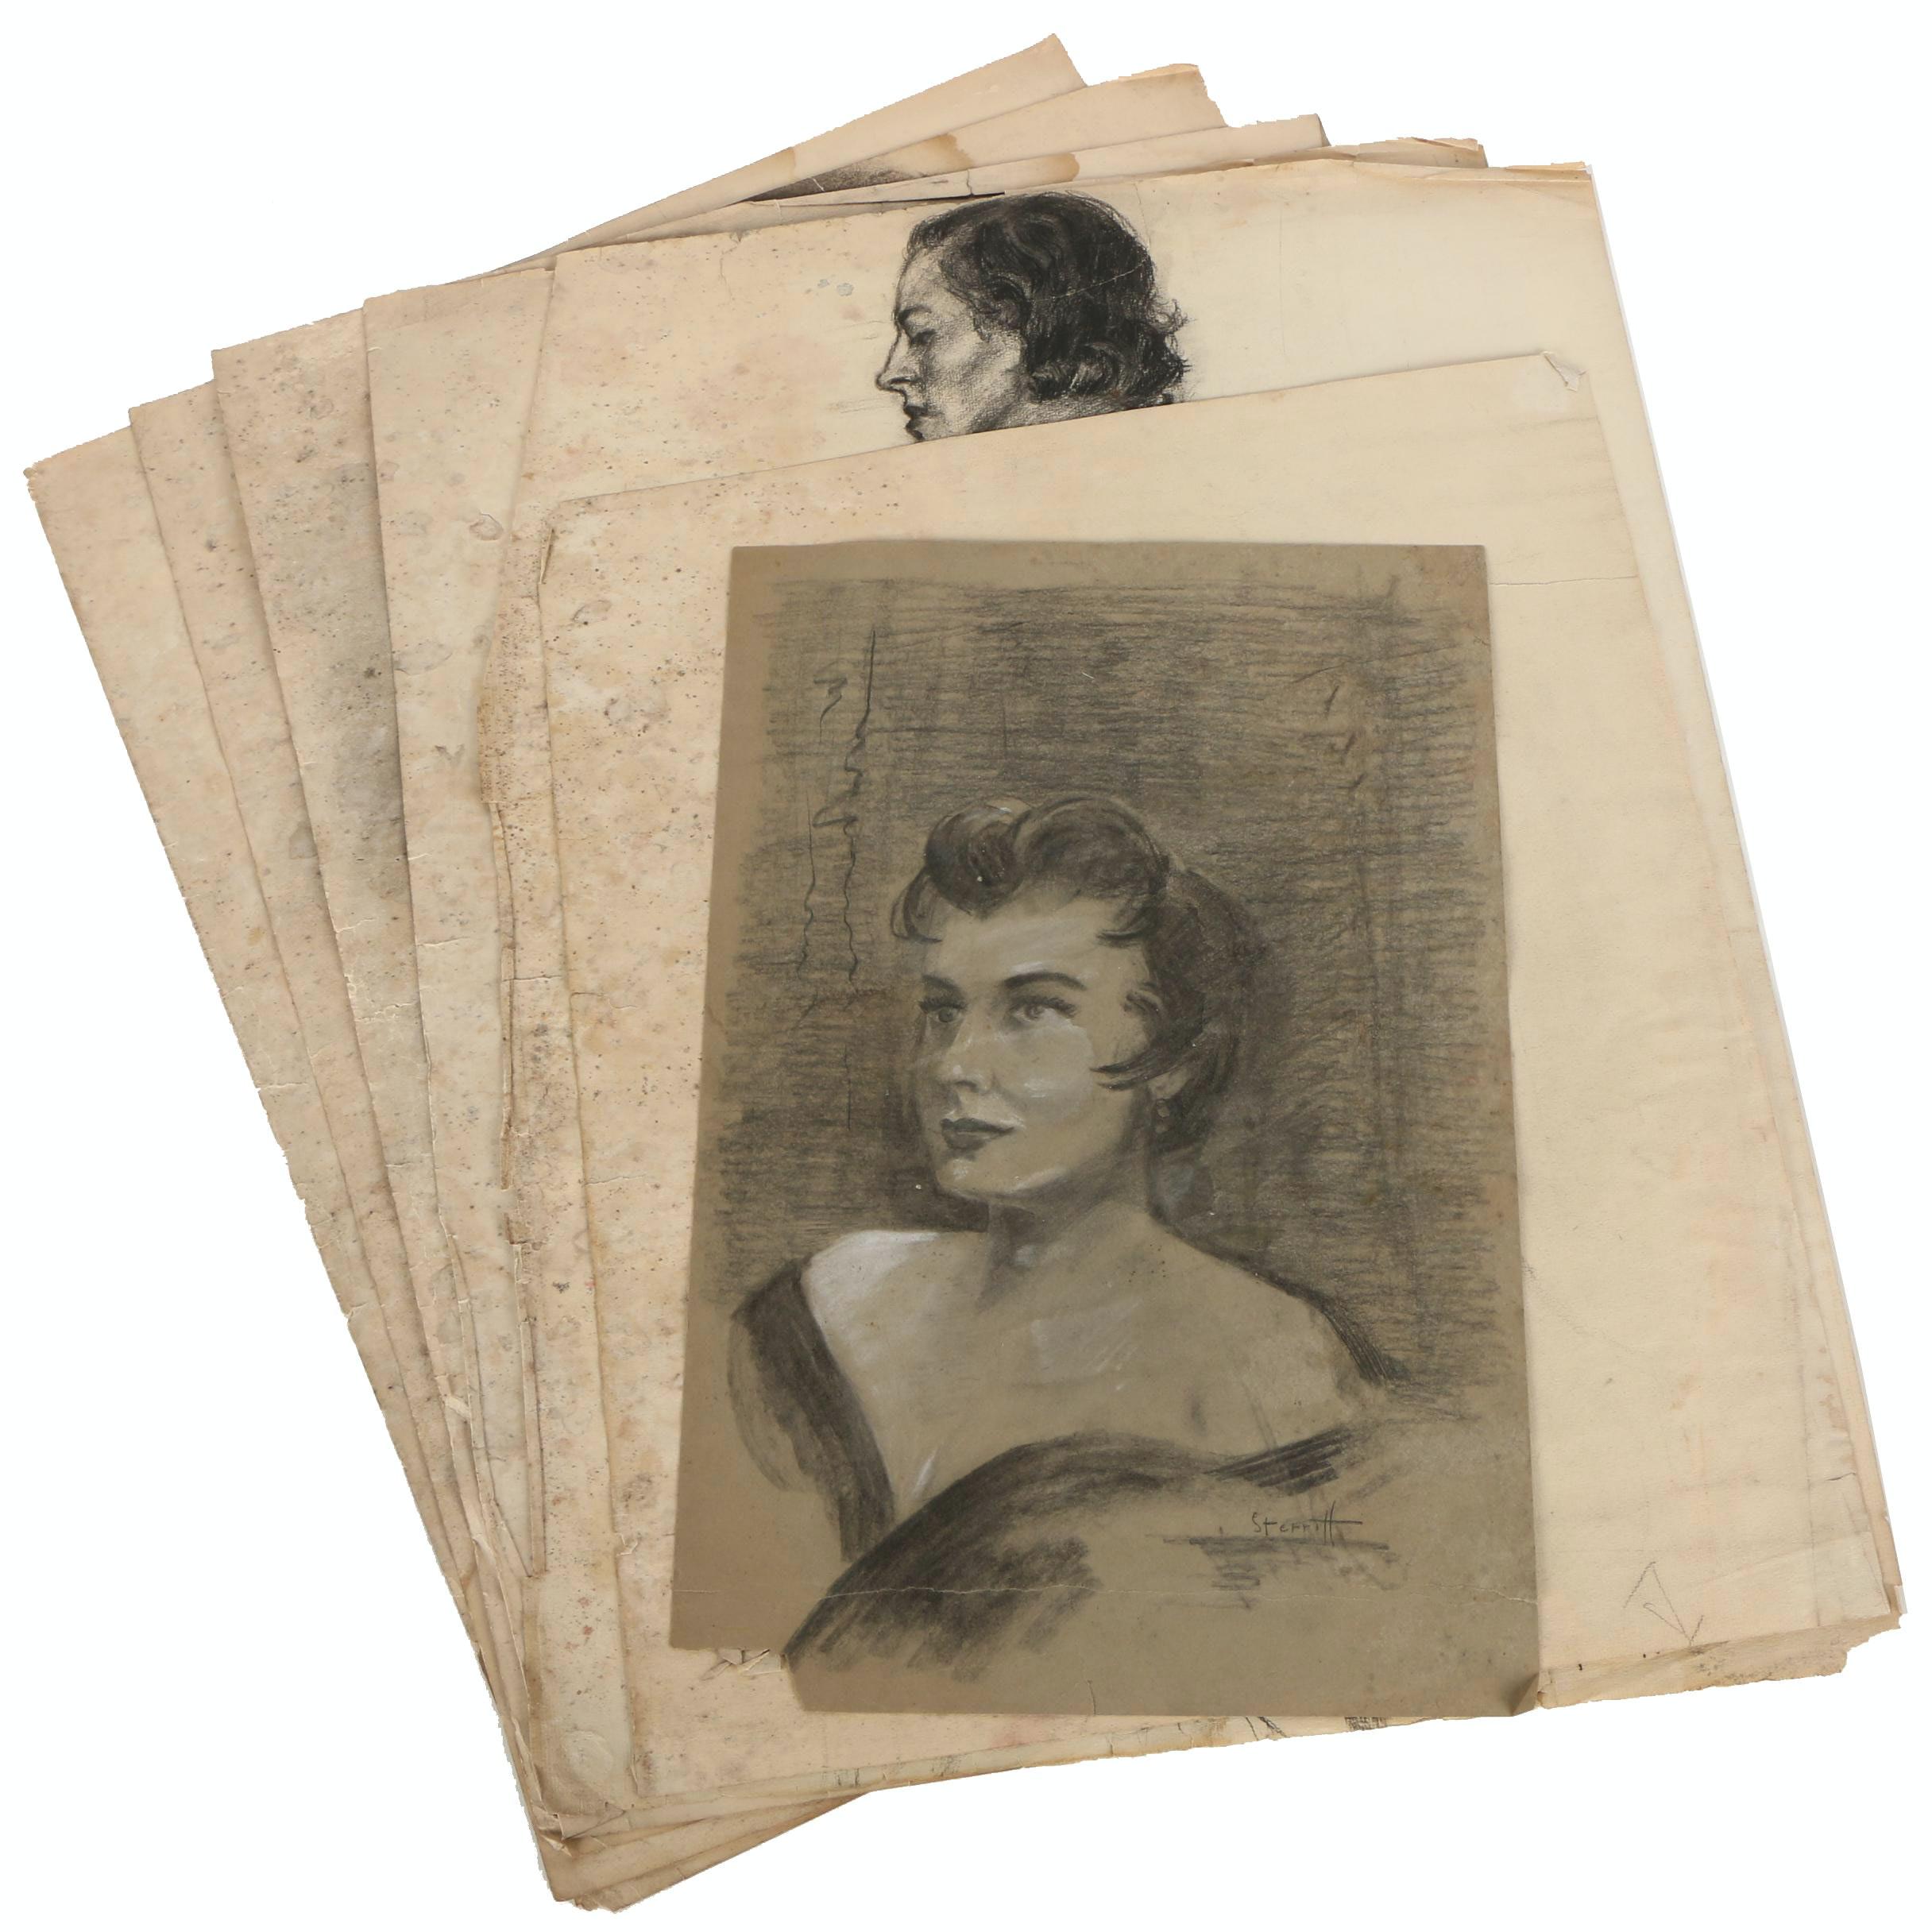 Paul Sterritt Charcoal Portrait Drawings